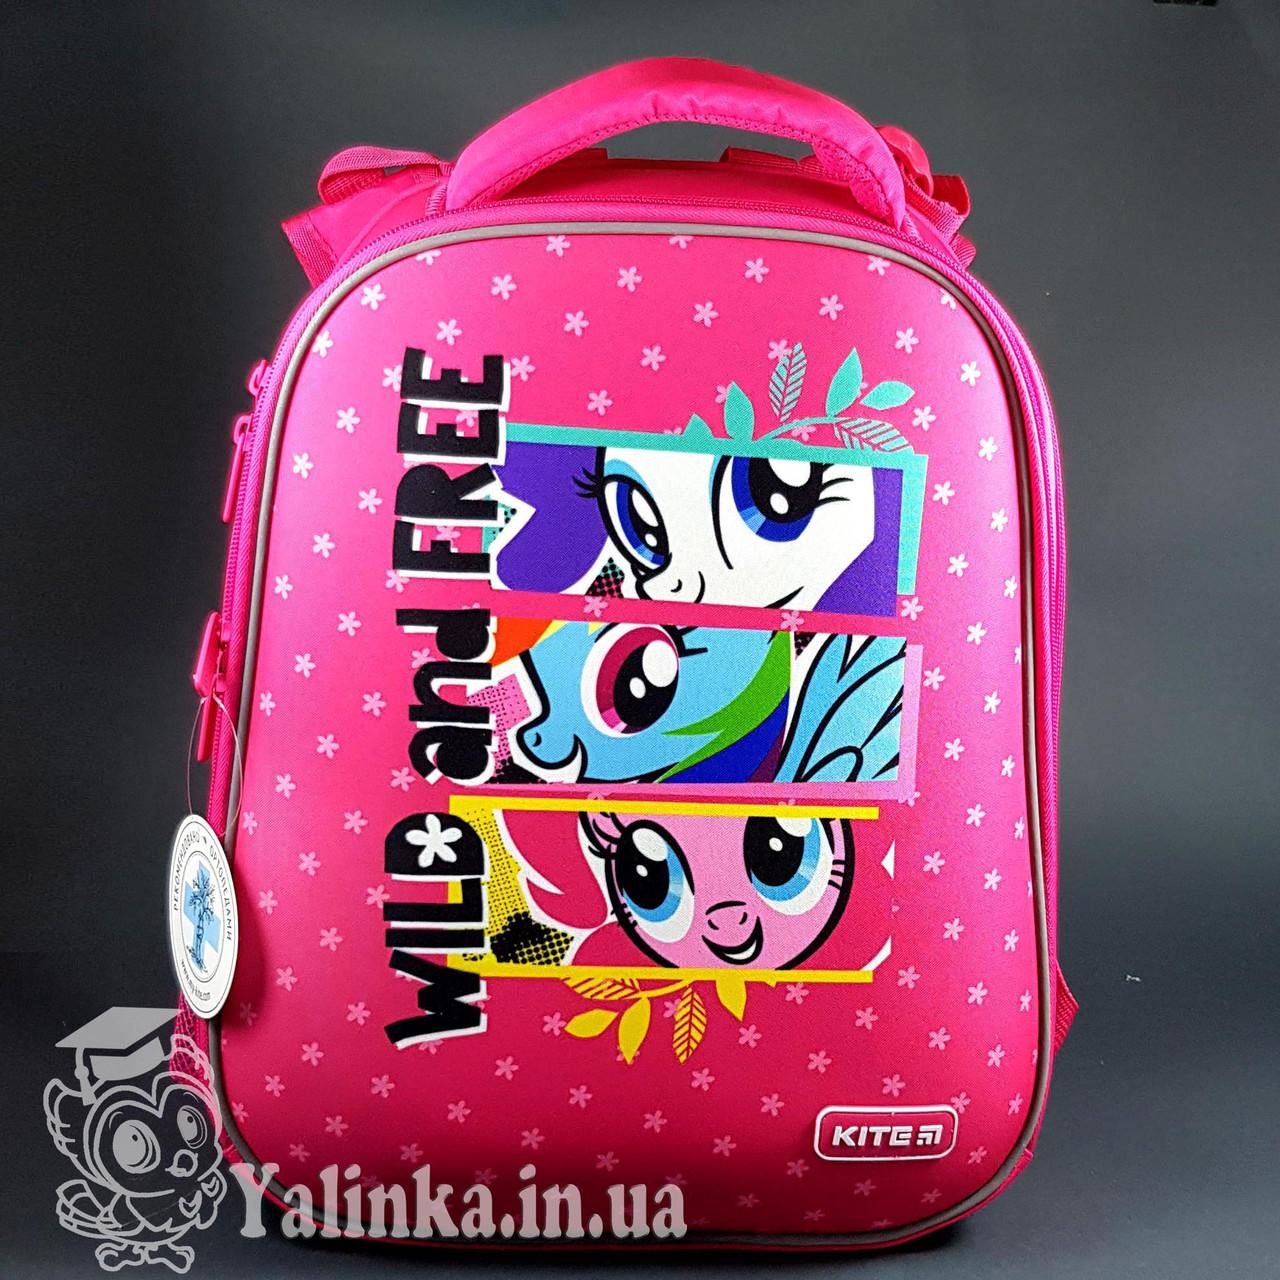 Рюкзак школьный каркасный Kite Education 531 LP LP19-531M ранец  рюкзак школьный hfytw ranec